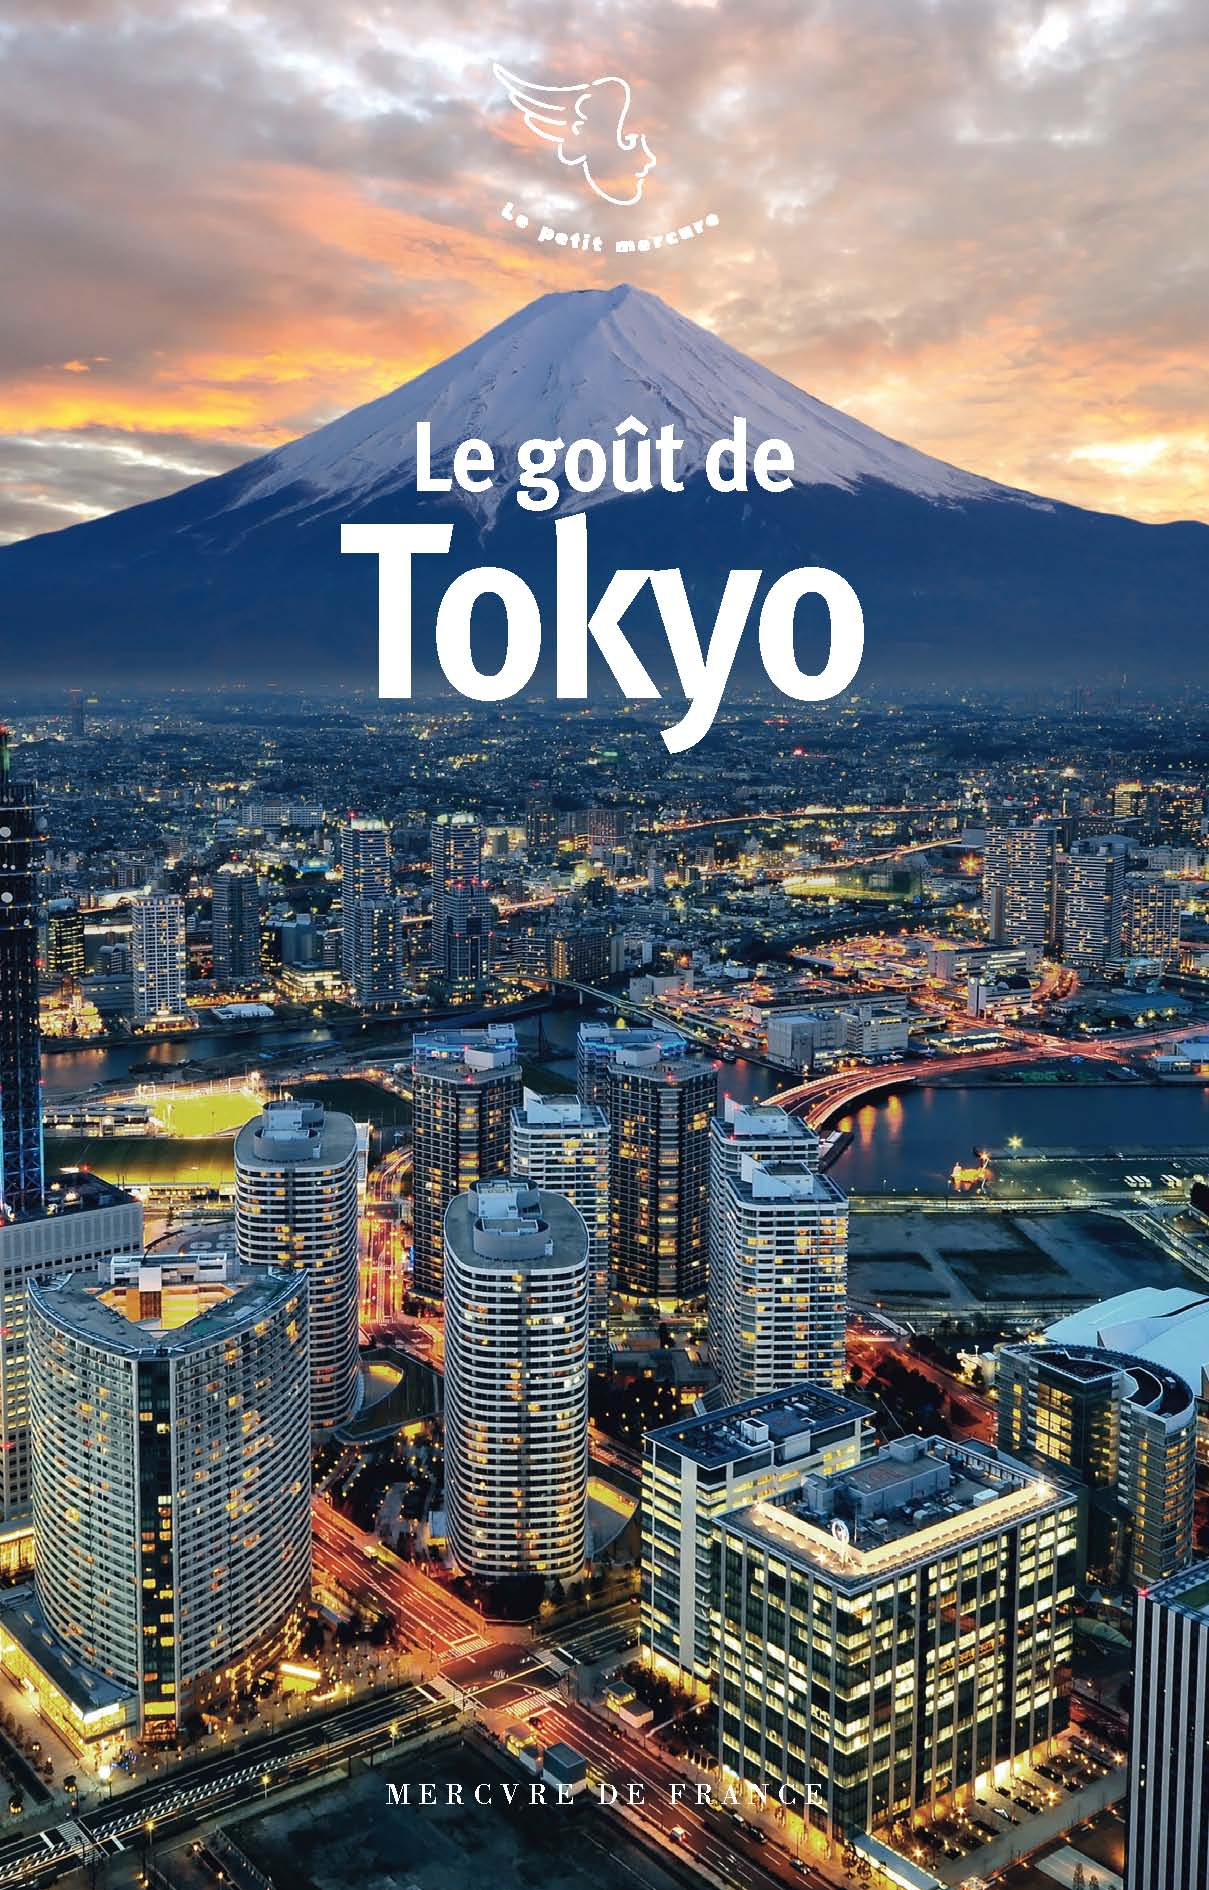 Le Goût de Tokyo 2017